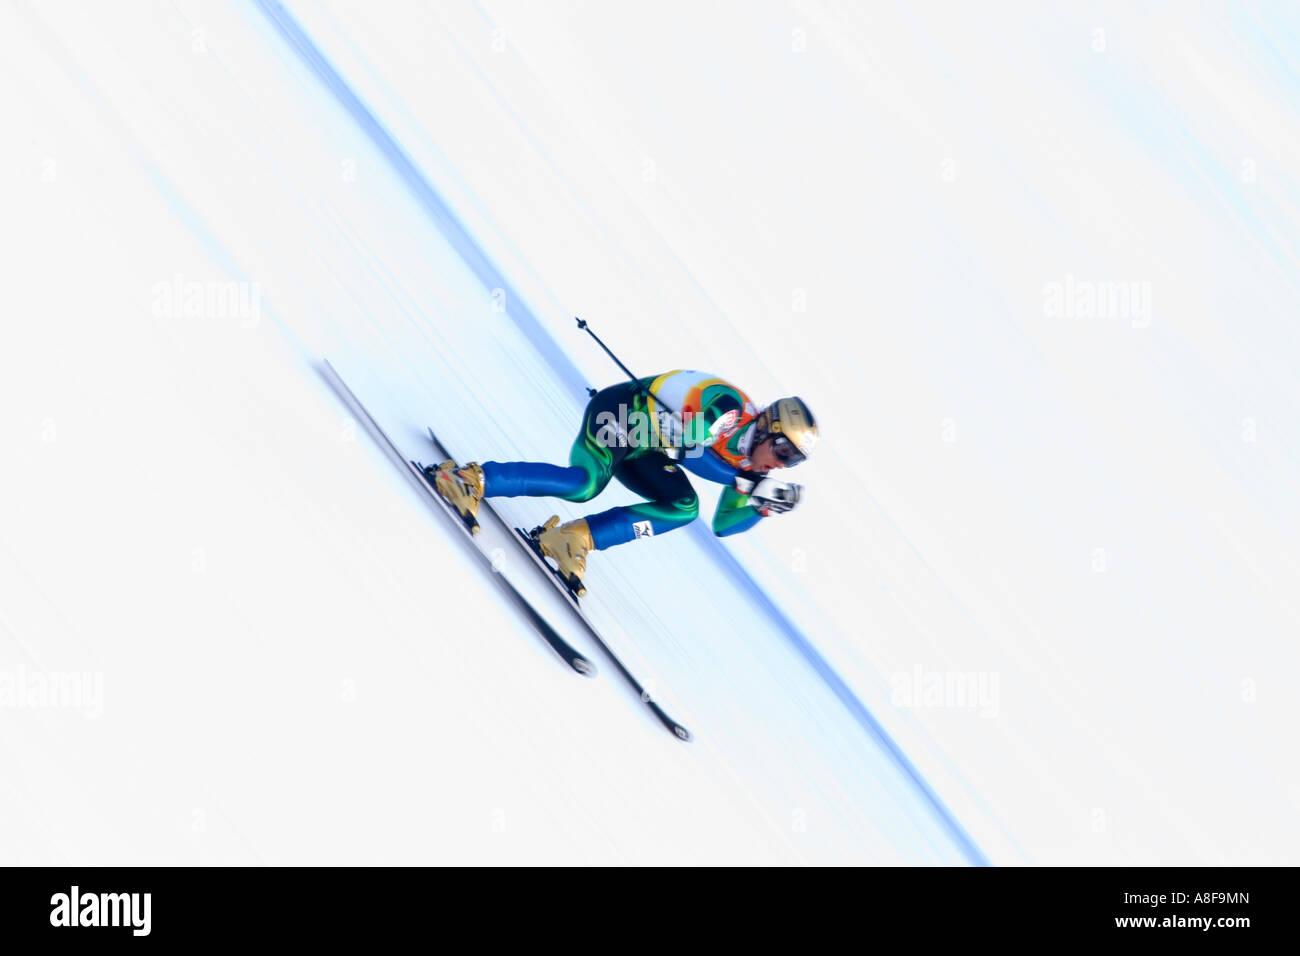 A Downhill Ski Racer - Stock Image